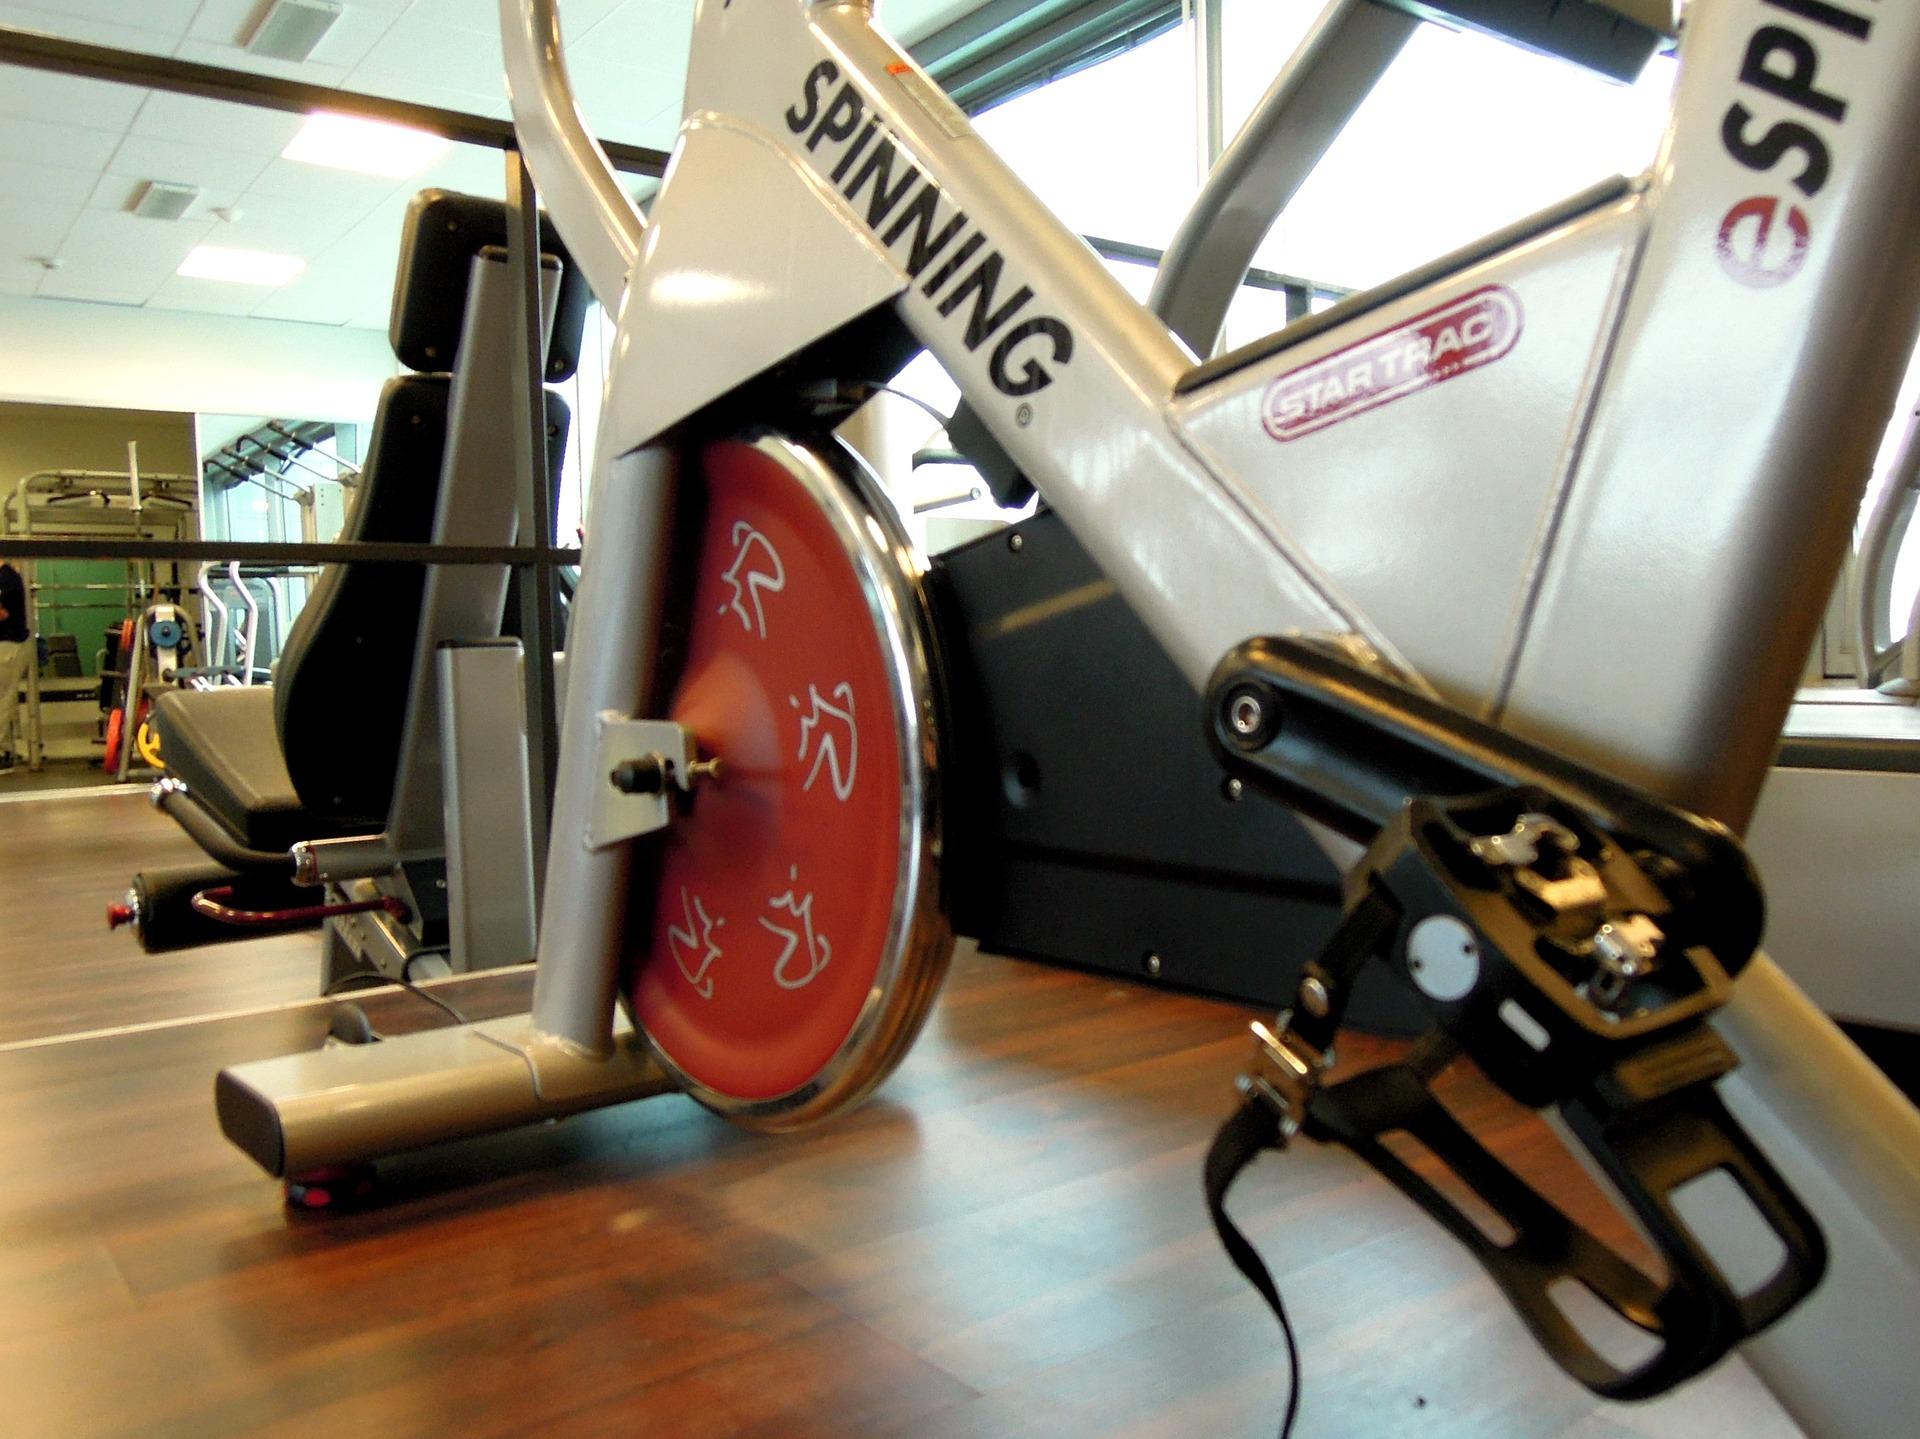 NEW!!!  STUDIO CYCLING CLASSES